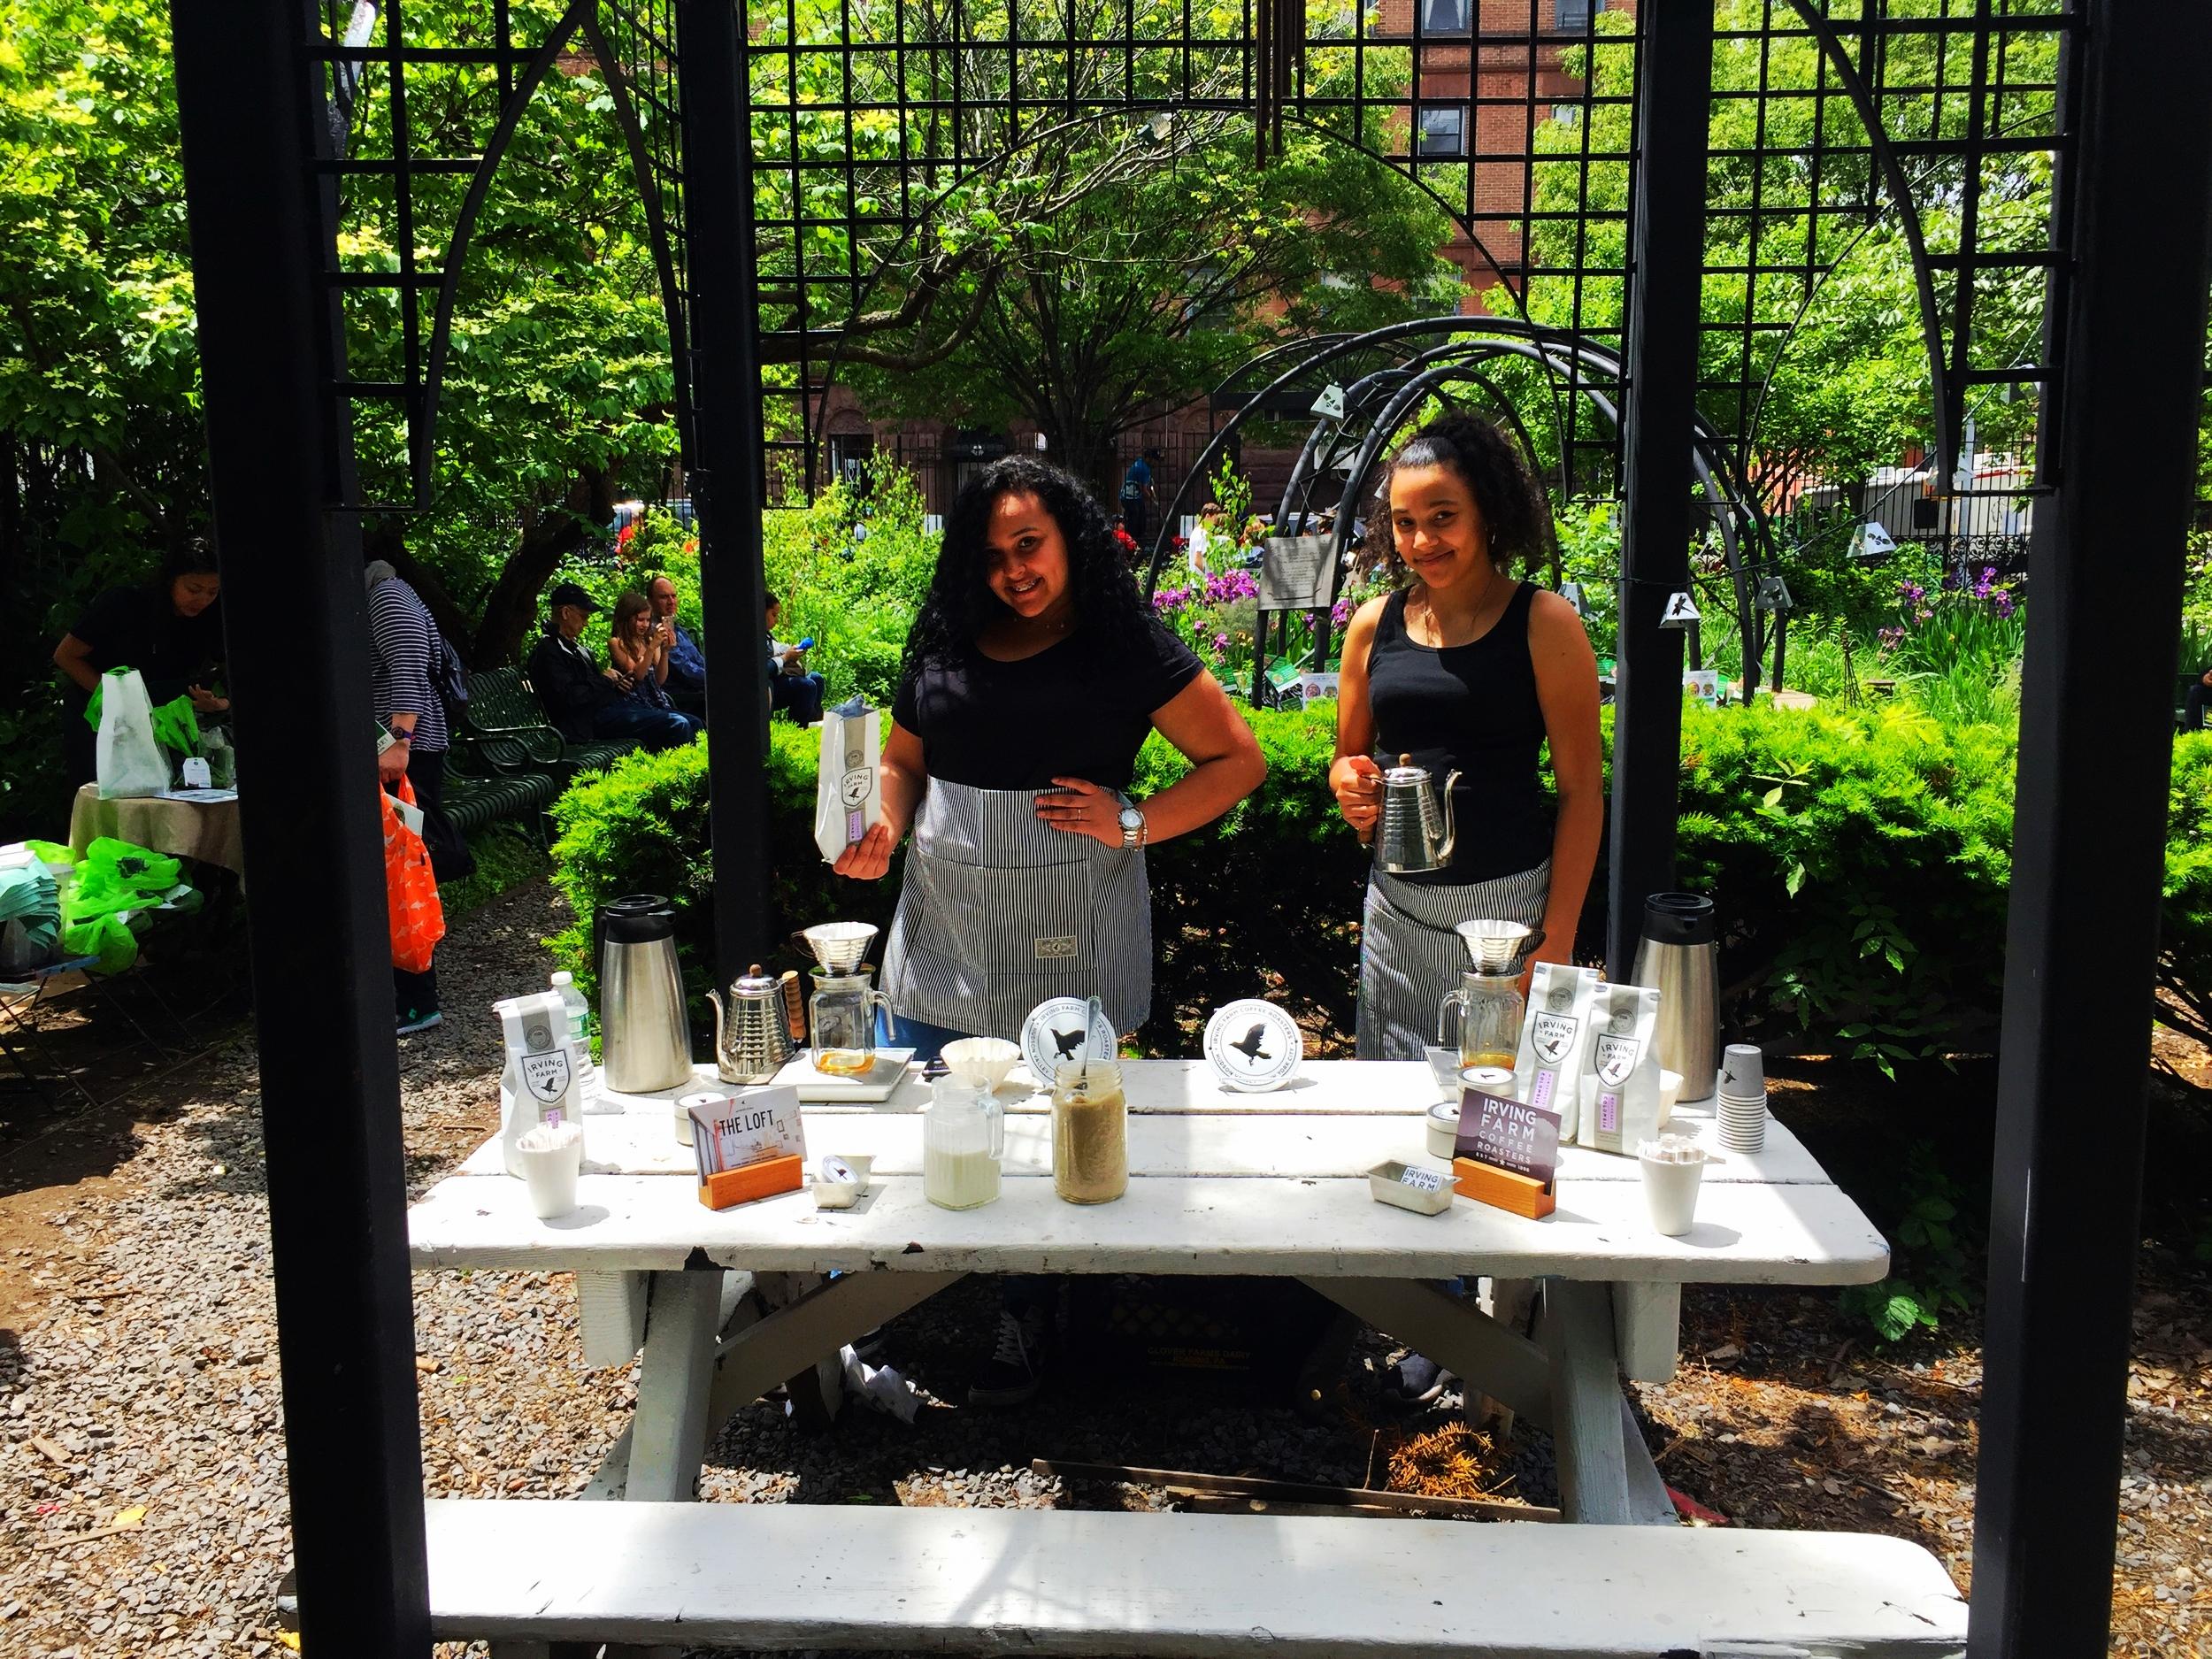 Sophomores Johancarla Taconas and Alysha Ramirez provide service with a smile